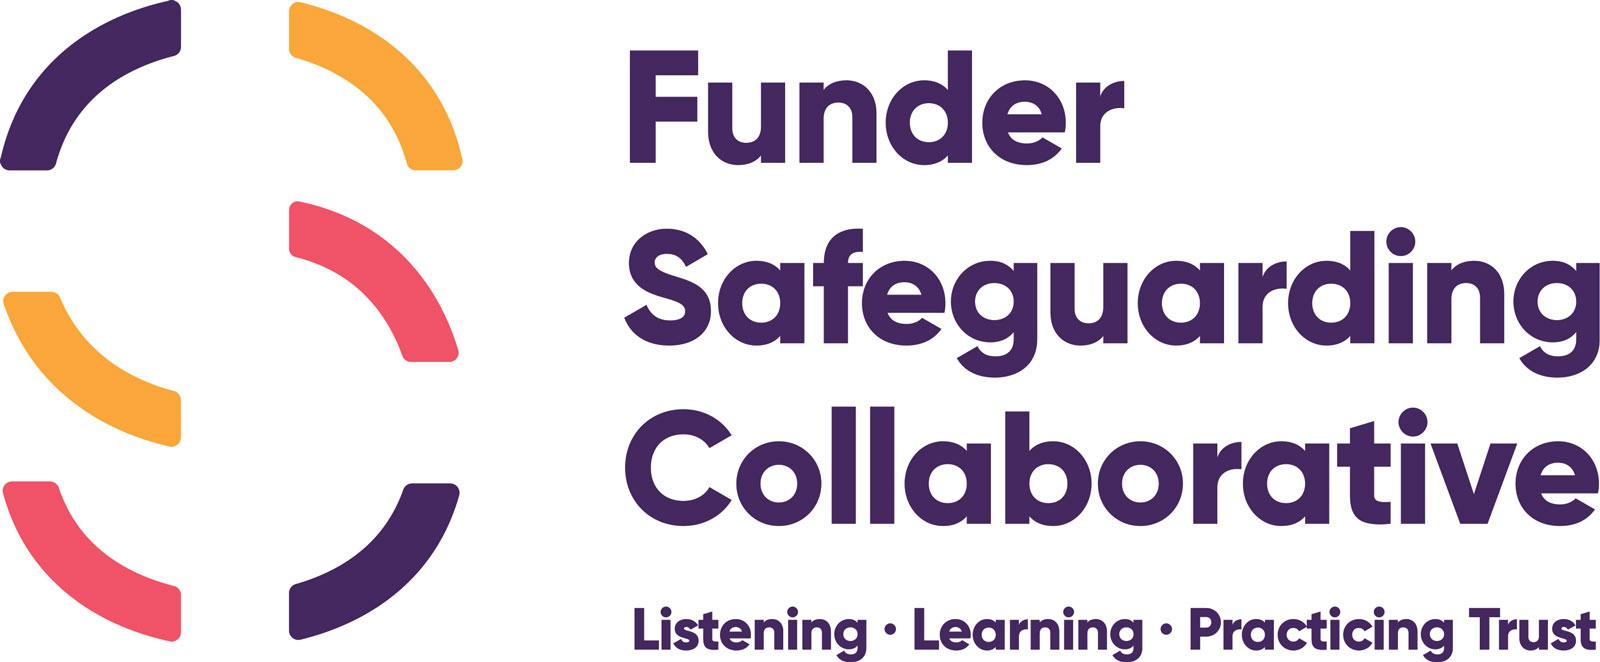 Funder Safeguarding Collaborative logo